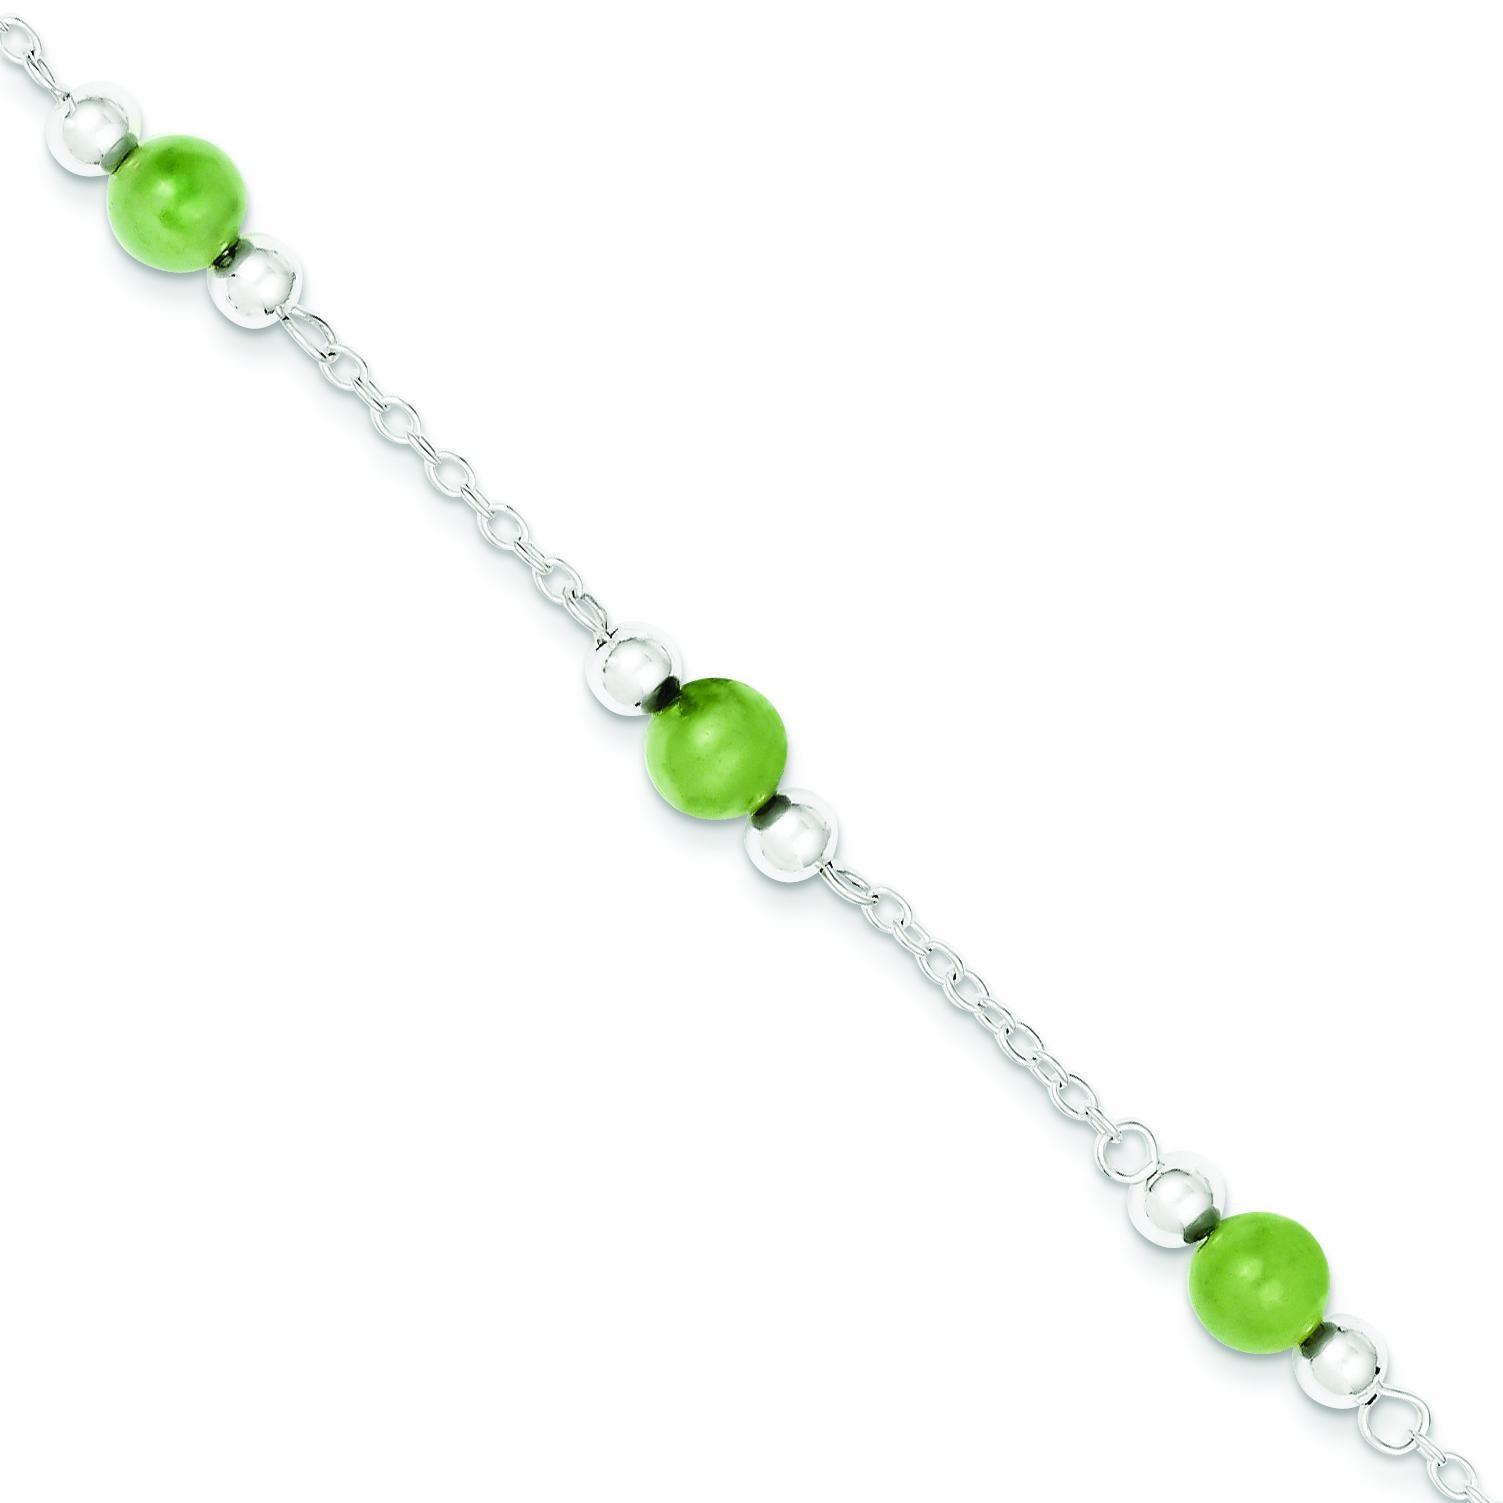 Green Jade Anklet in Sterling Silver